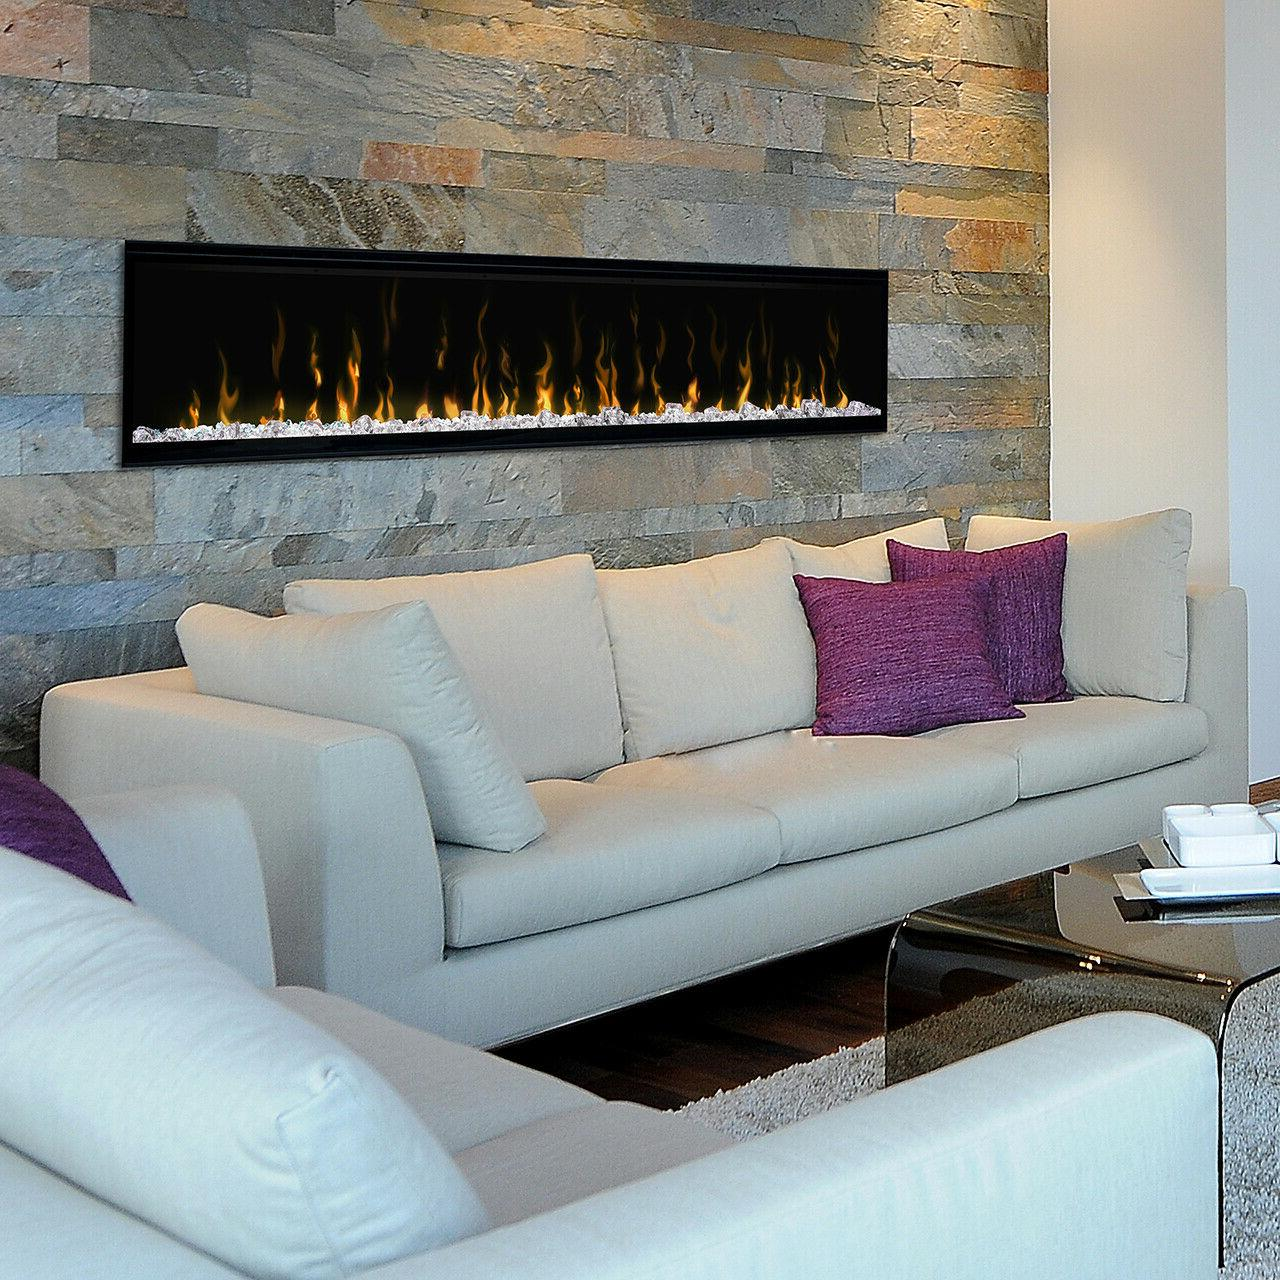 Dimplex Ignite XL 60 inch Linear Electric Fireplace - XLF60